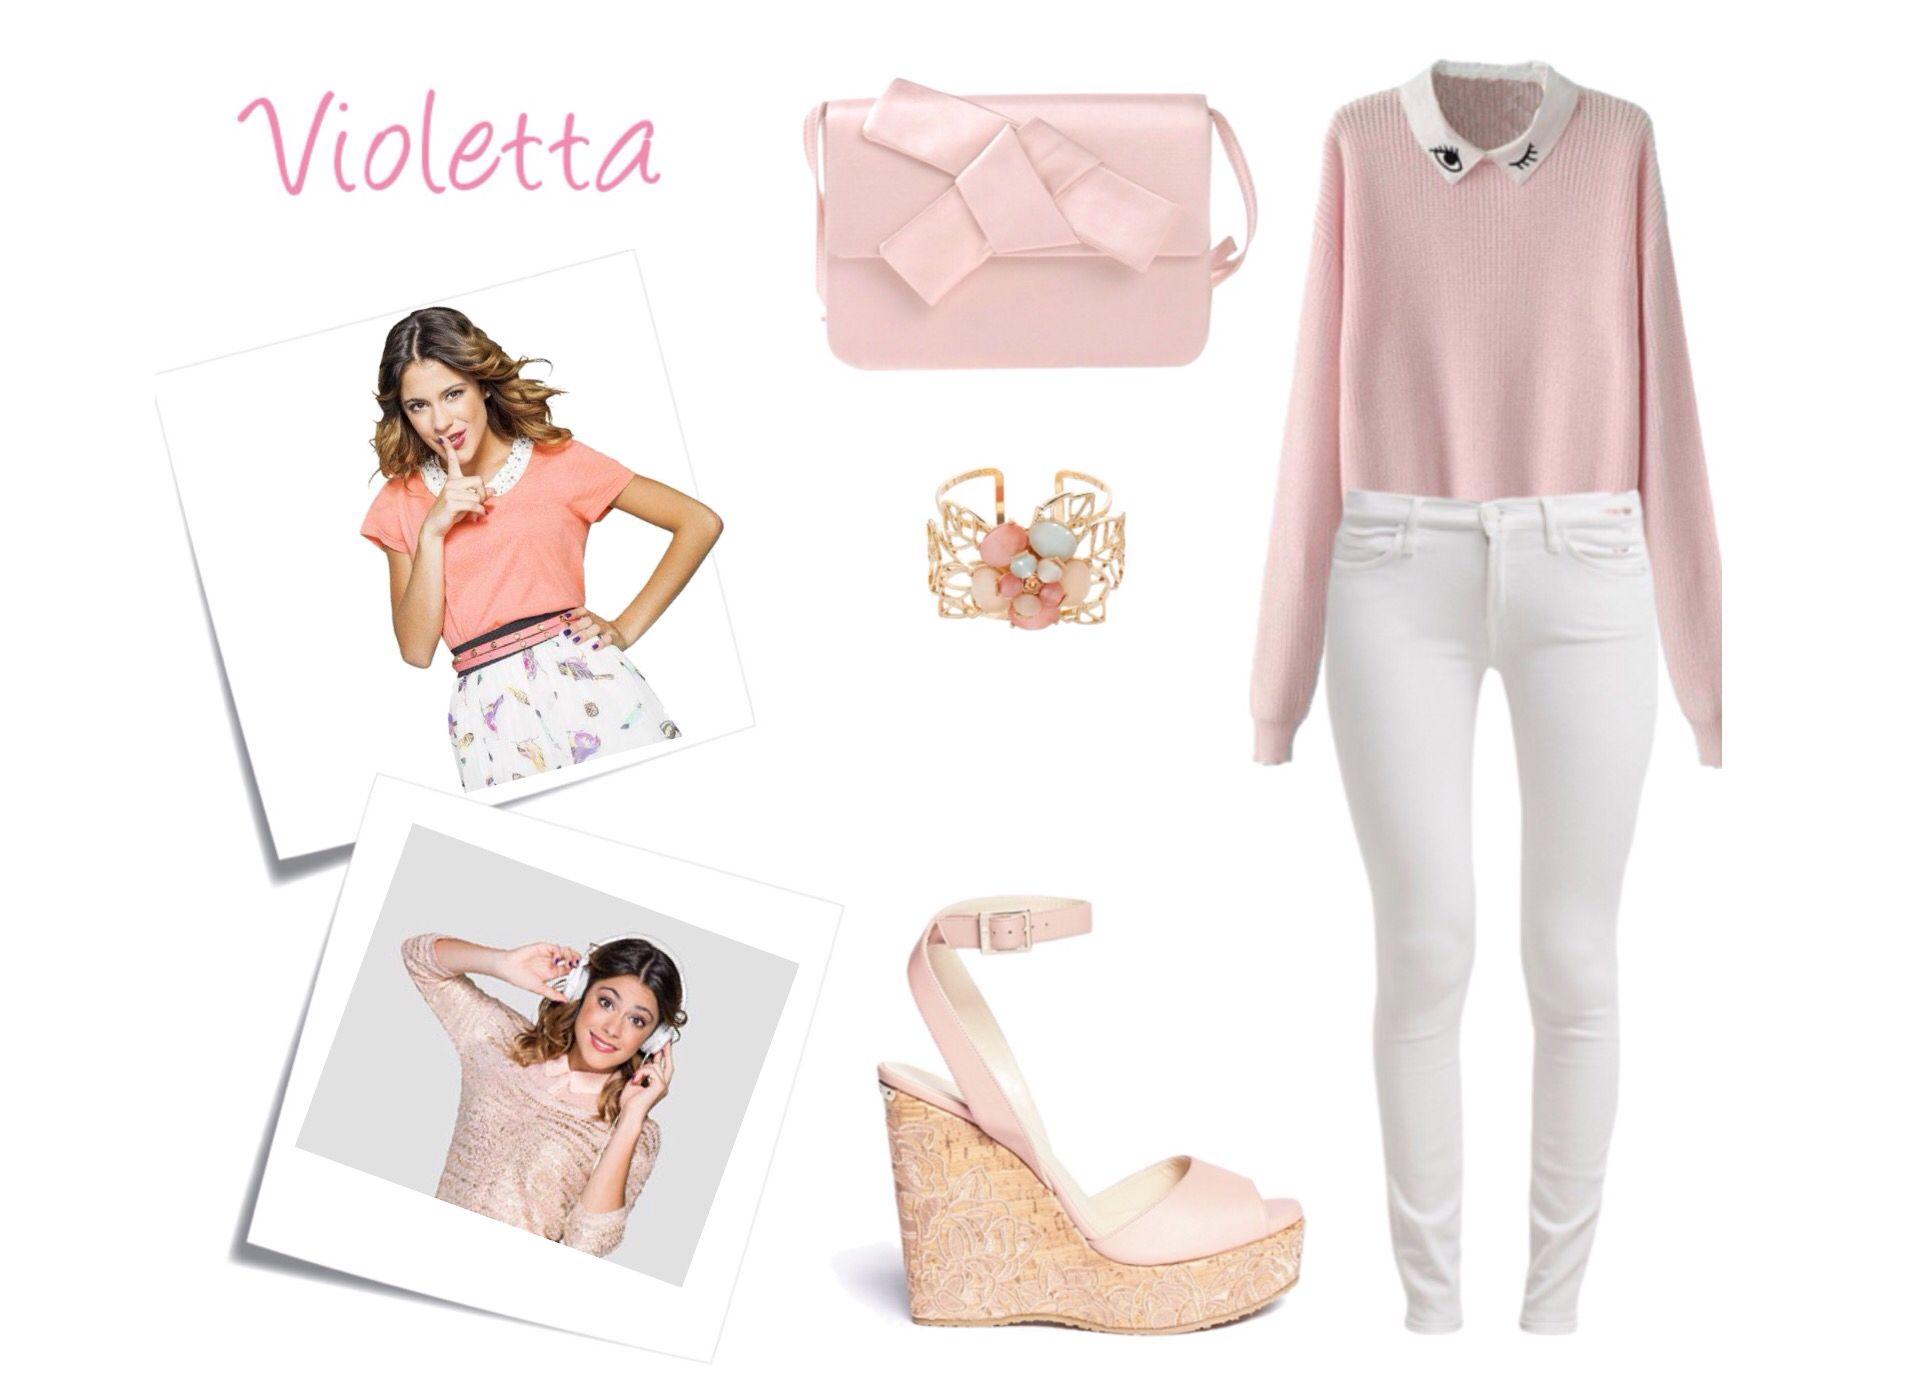 Violetta Tenu 1 Violetta Pinterest Clothes Clothing And Teen Girl Fashion